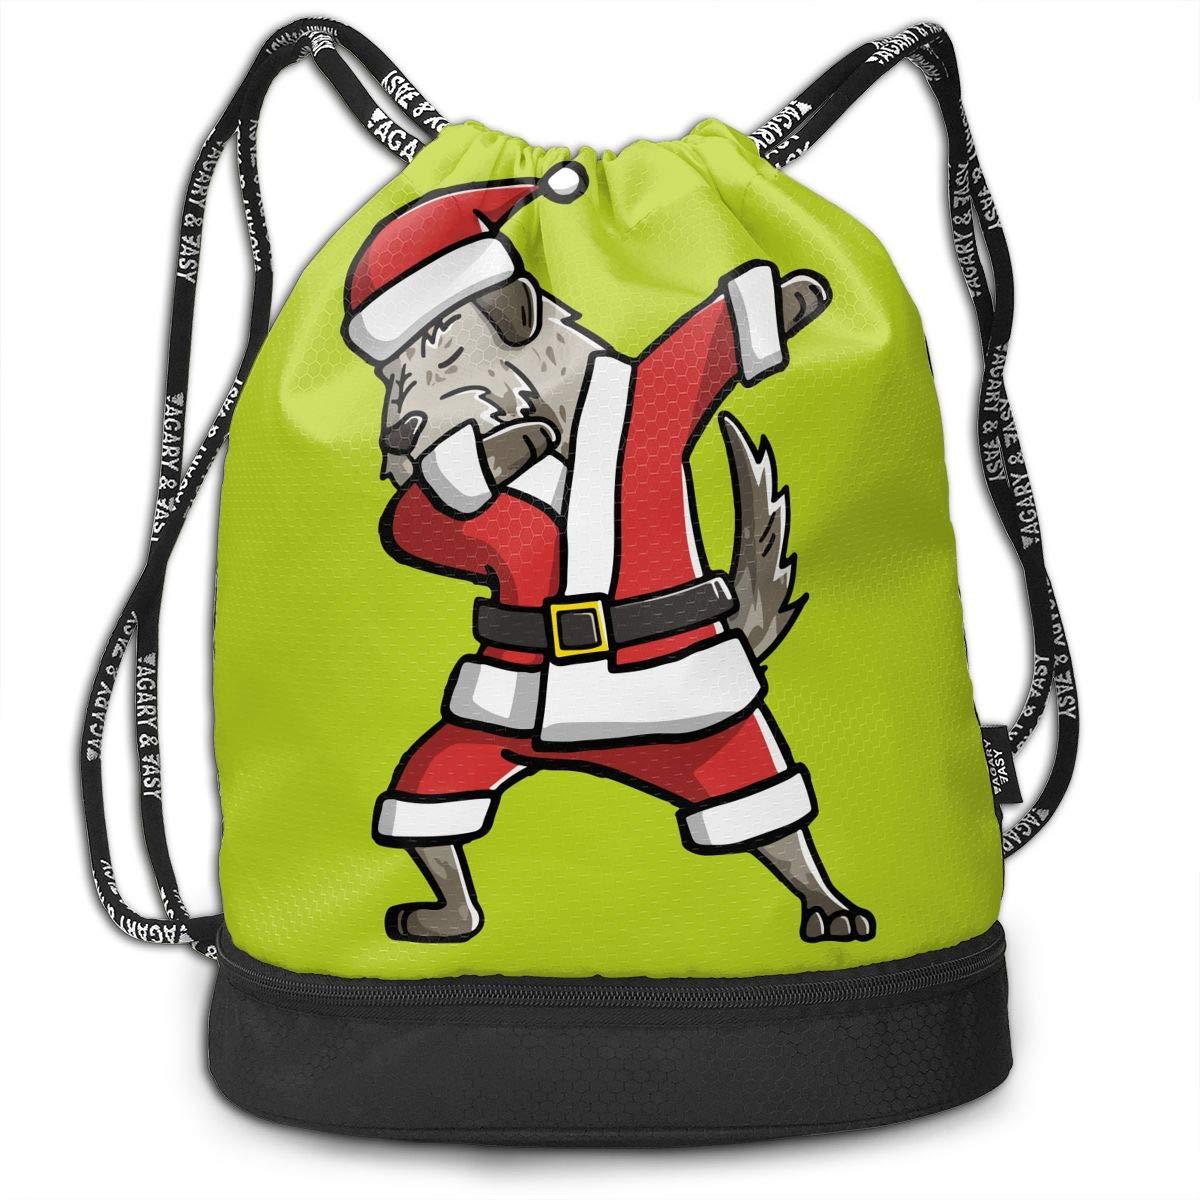 baad931f9834 Amazon.com  YyTiin Dabbing Irish Wolfhound Ugly Christmas Men Women  Waterproof Drawstring Backpack Sports Dance Storage Bags Sackpack Gym  Traveling Outdoor  ...